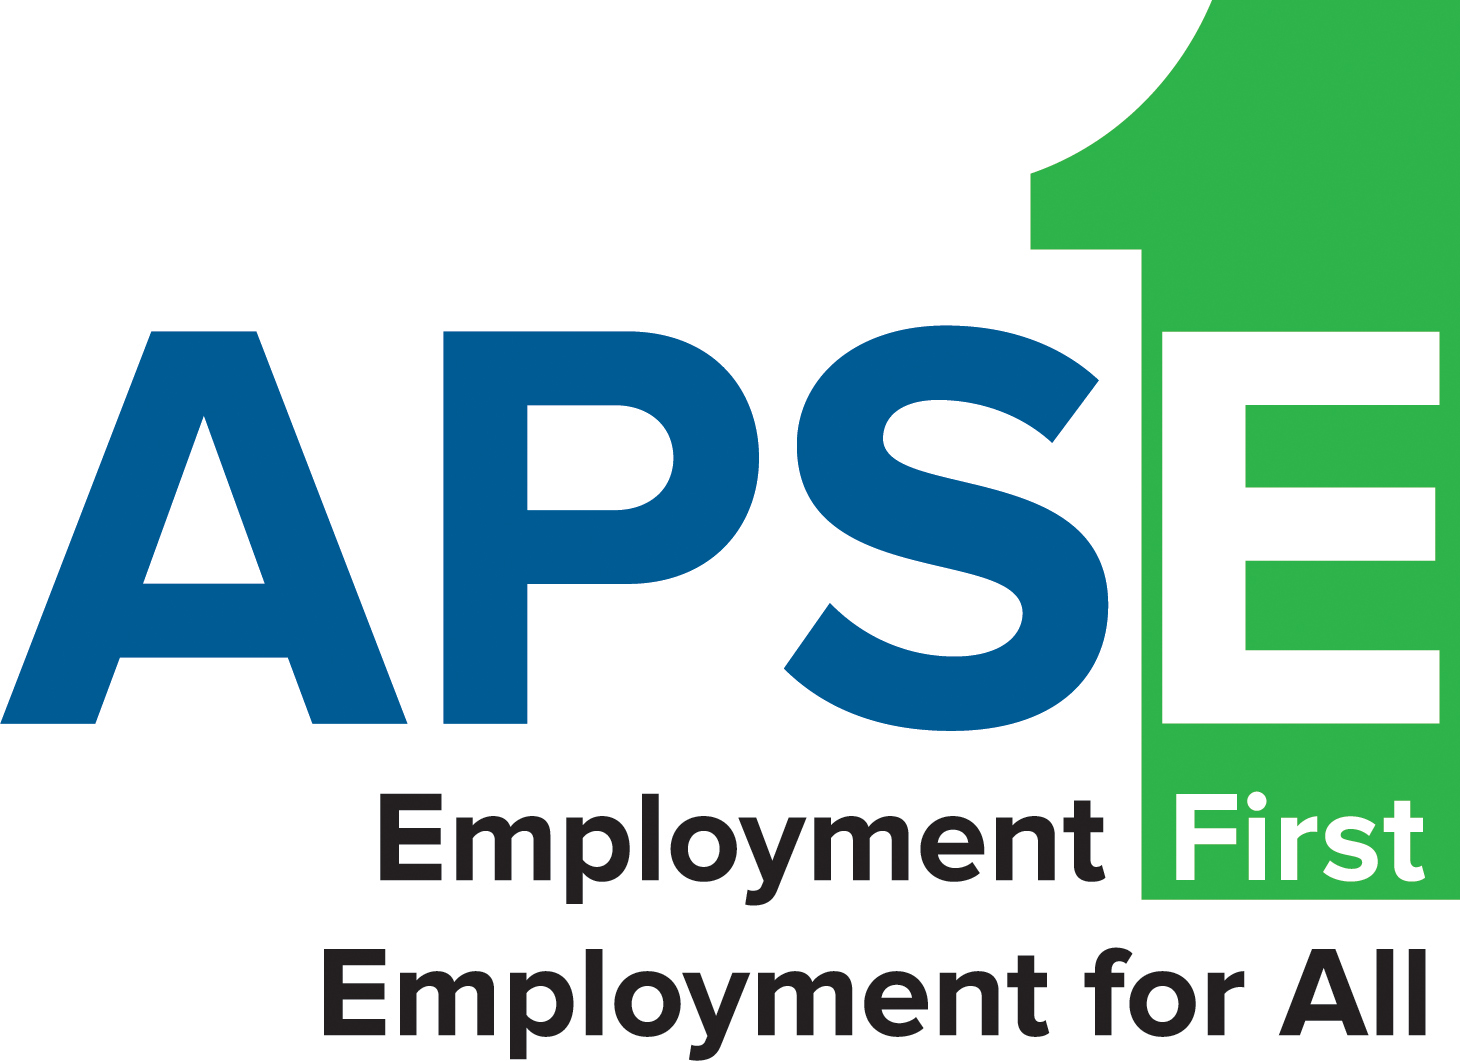 APSE Logo-EmploymentFirst Employment for All